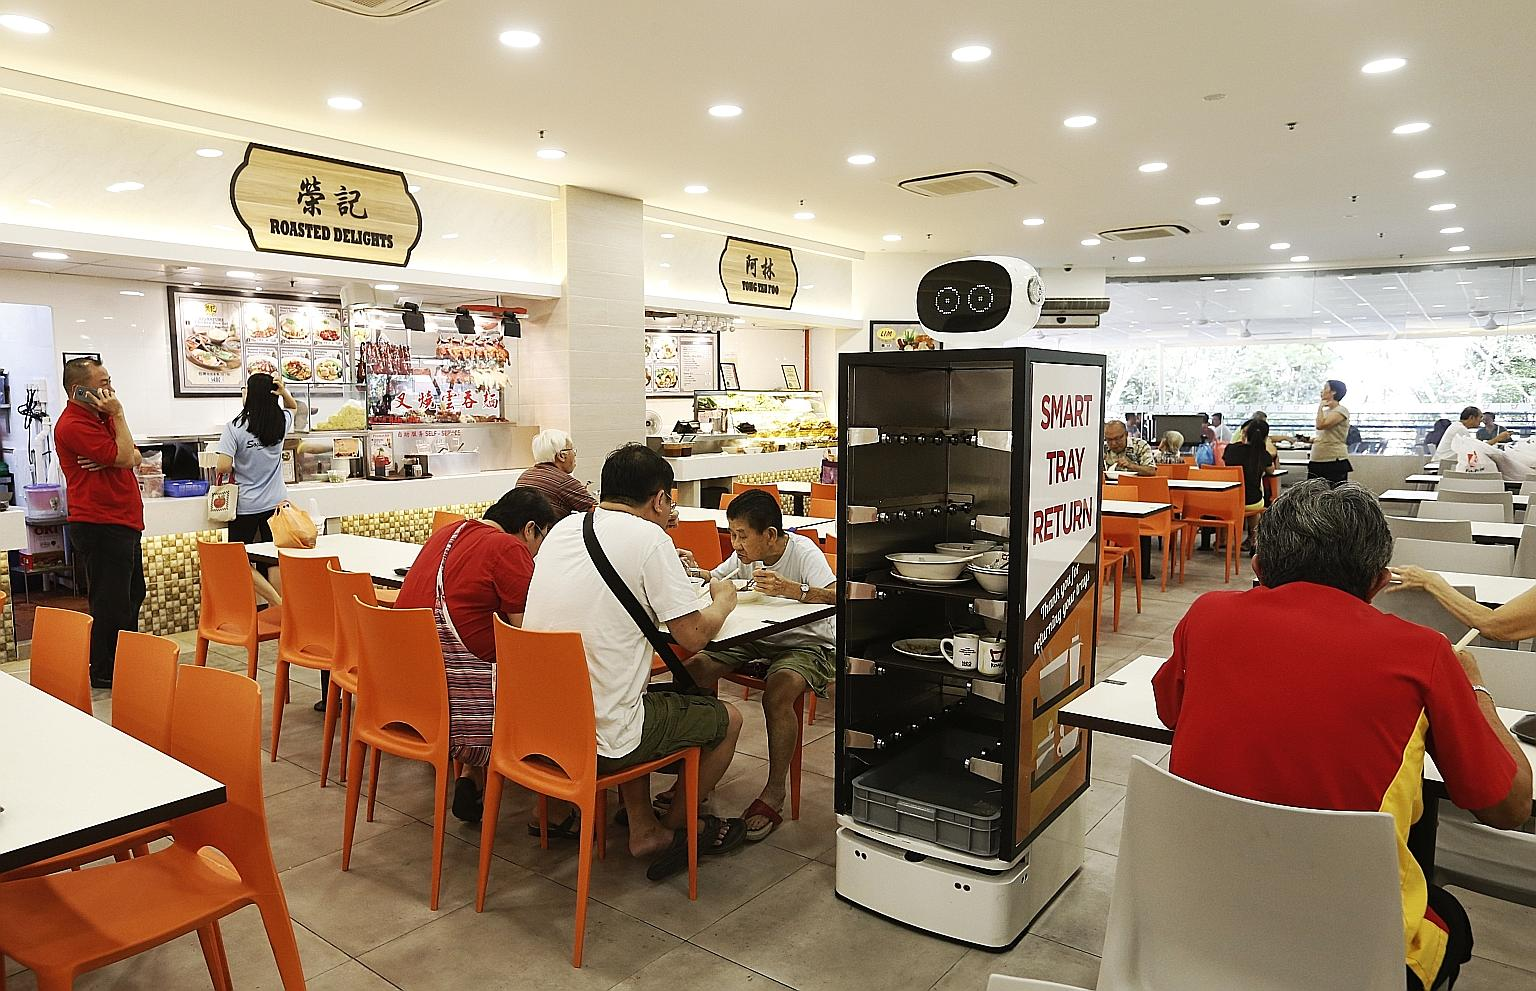 SMU KOUFU - 1. Malay Cuisine2. Match 'n' Go3. Chicken Heaven (Coming soon!)